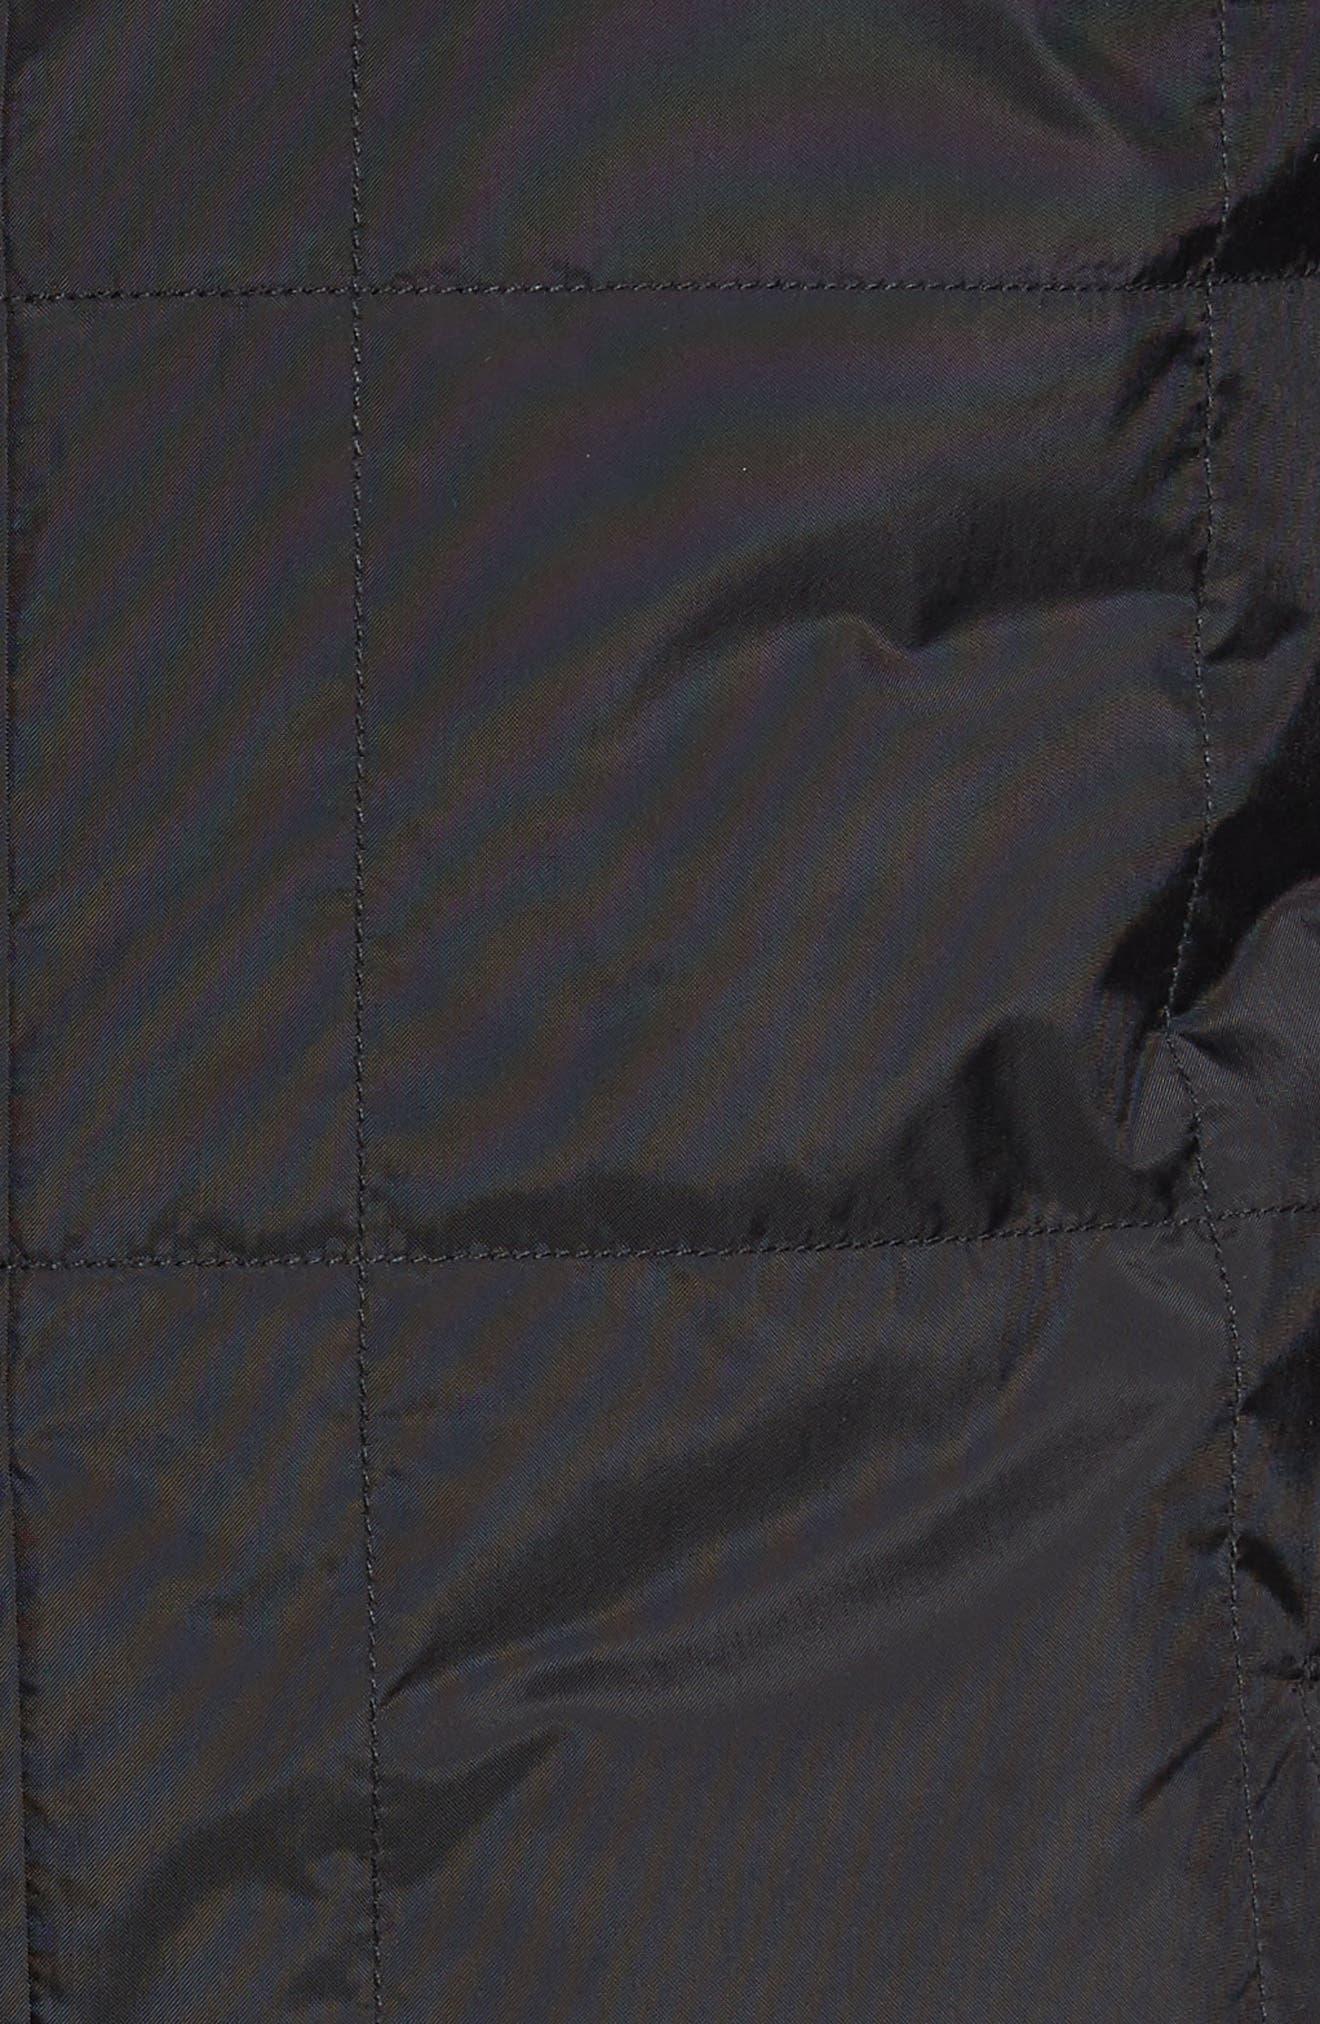 Santiago III Water Repellent Quilted Jacket,                             Alternate thumbnail 5, color,                             001